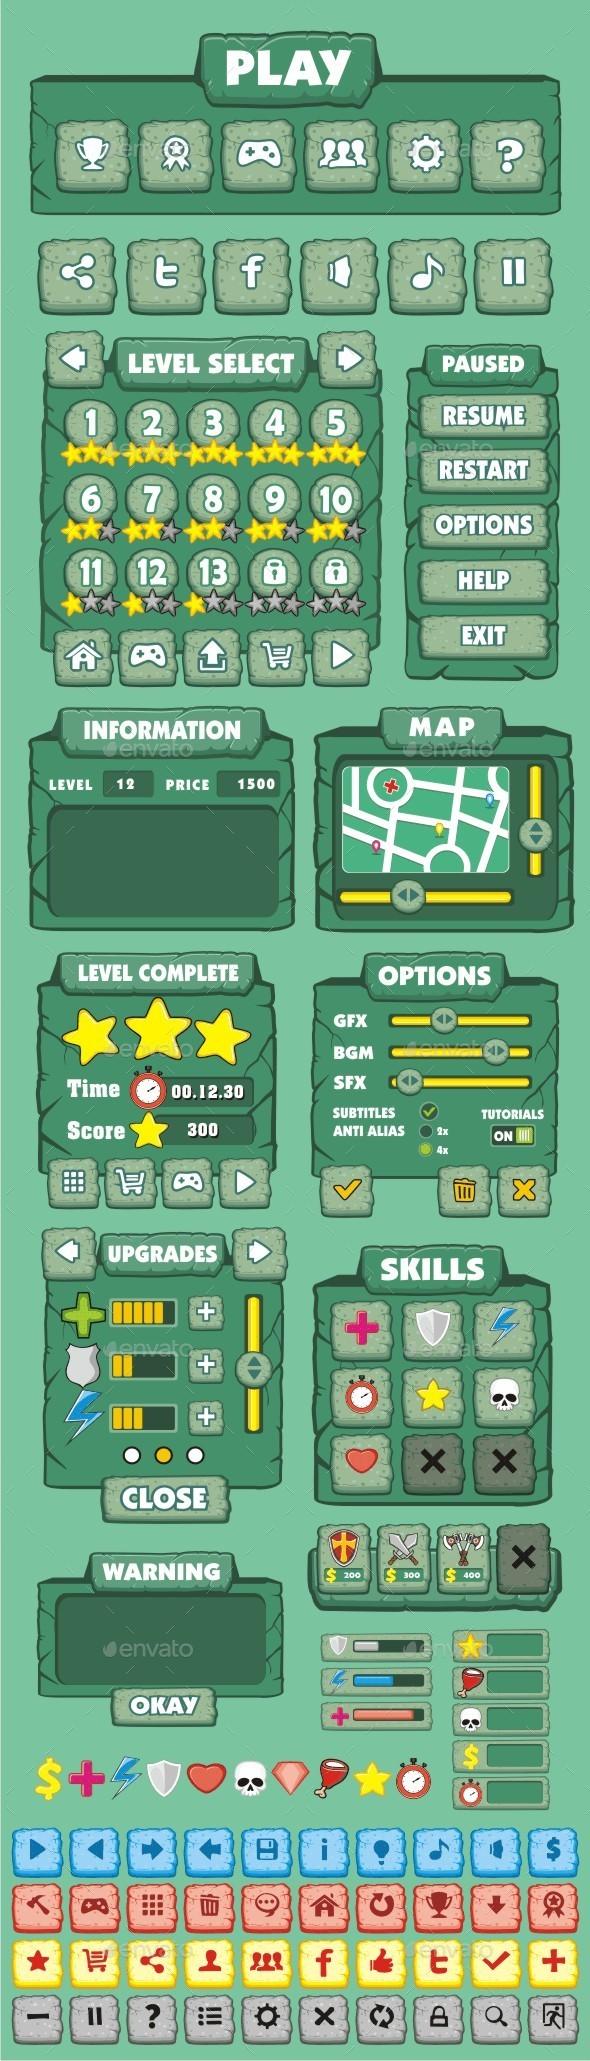 GraphicRiver cartoon game gui pack 8 10511369